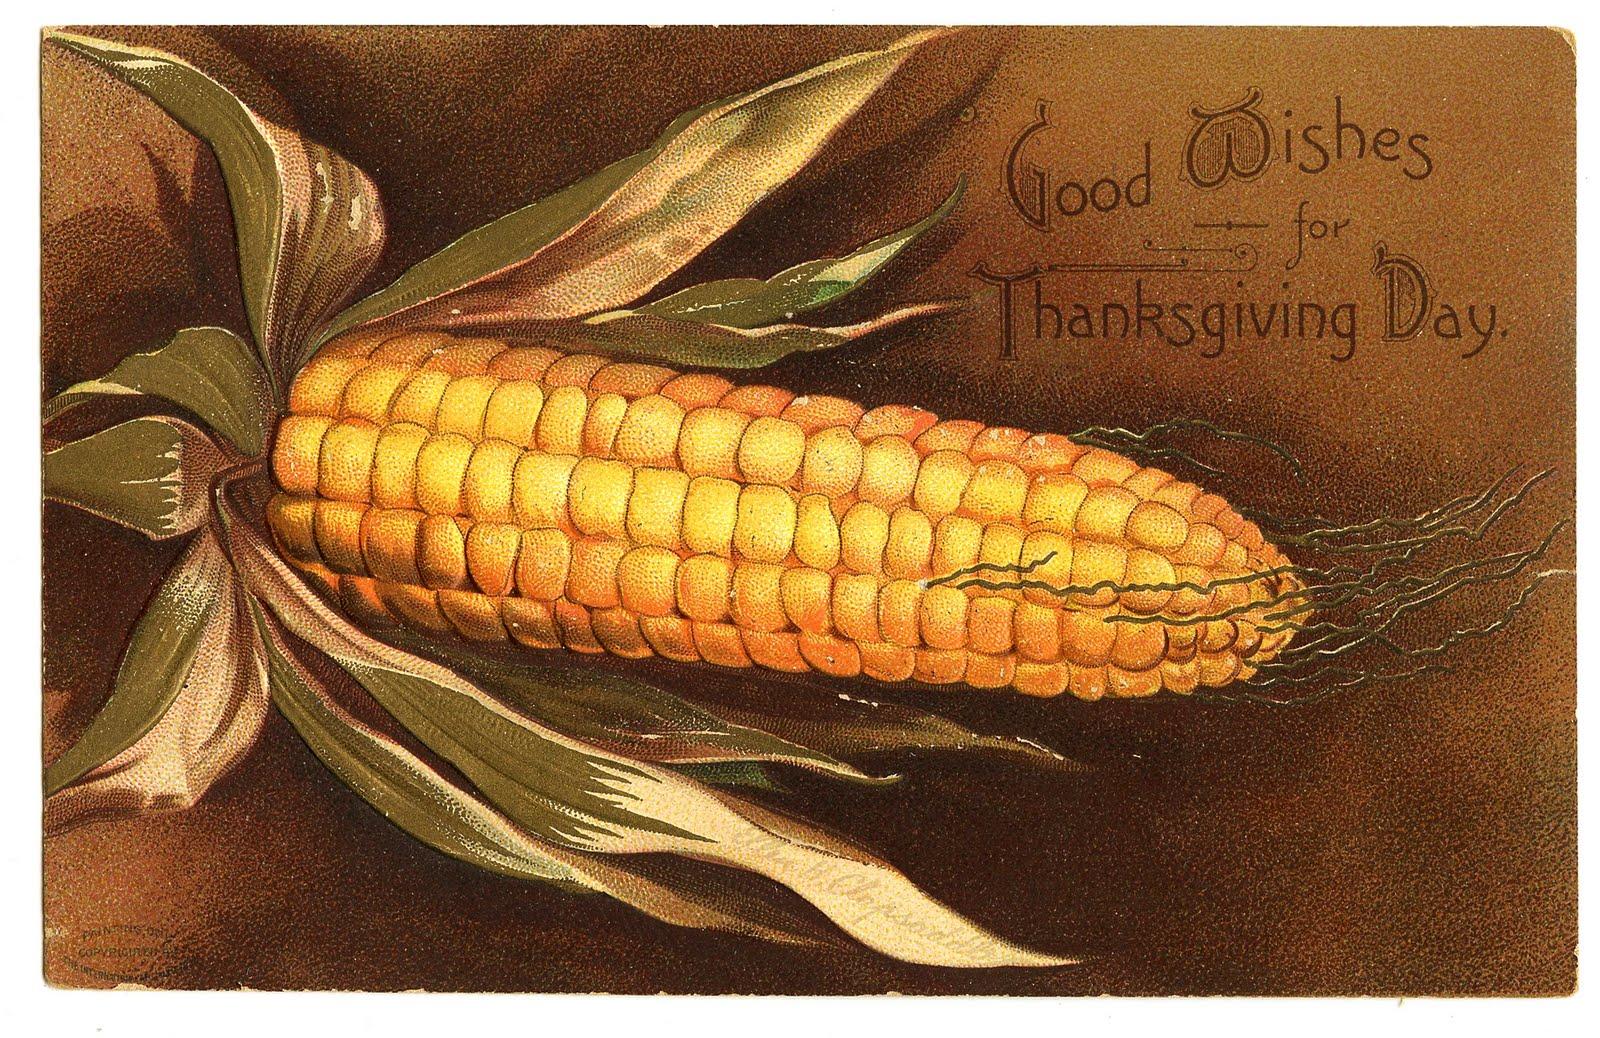 http://3.bp.blogspot.com/_CarNcodpCMA/TLkHbT1me-I/AAAAAAAAJbI/Pr6KExECb18/s1600/thanksgivingcorn-graphicsfairy009.jpg